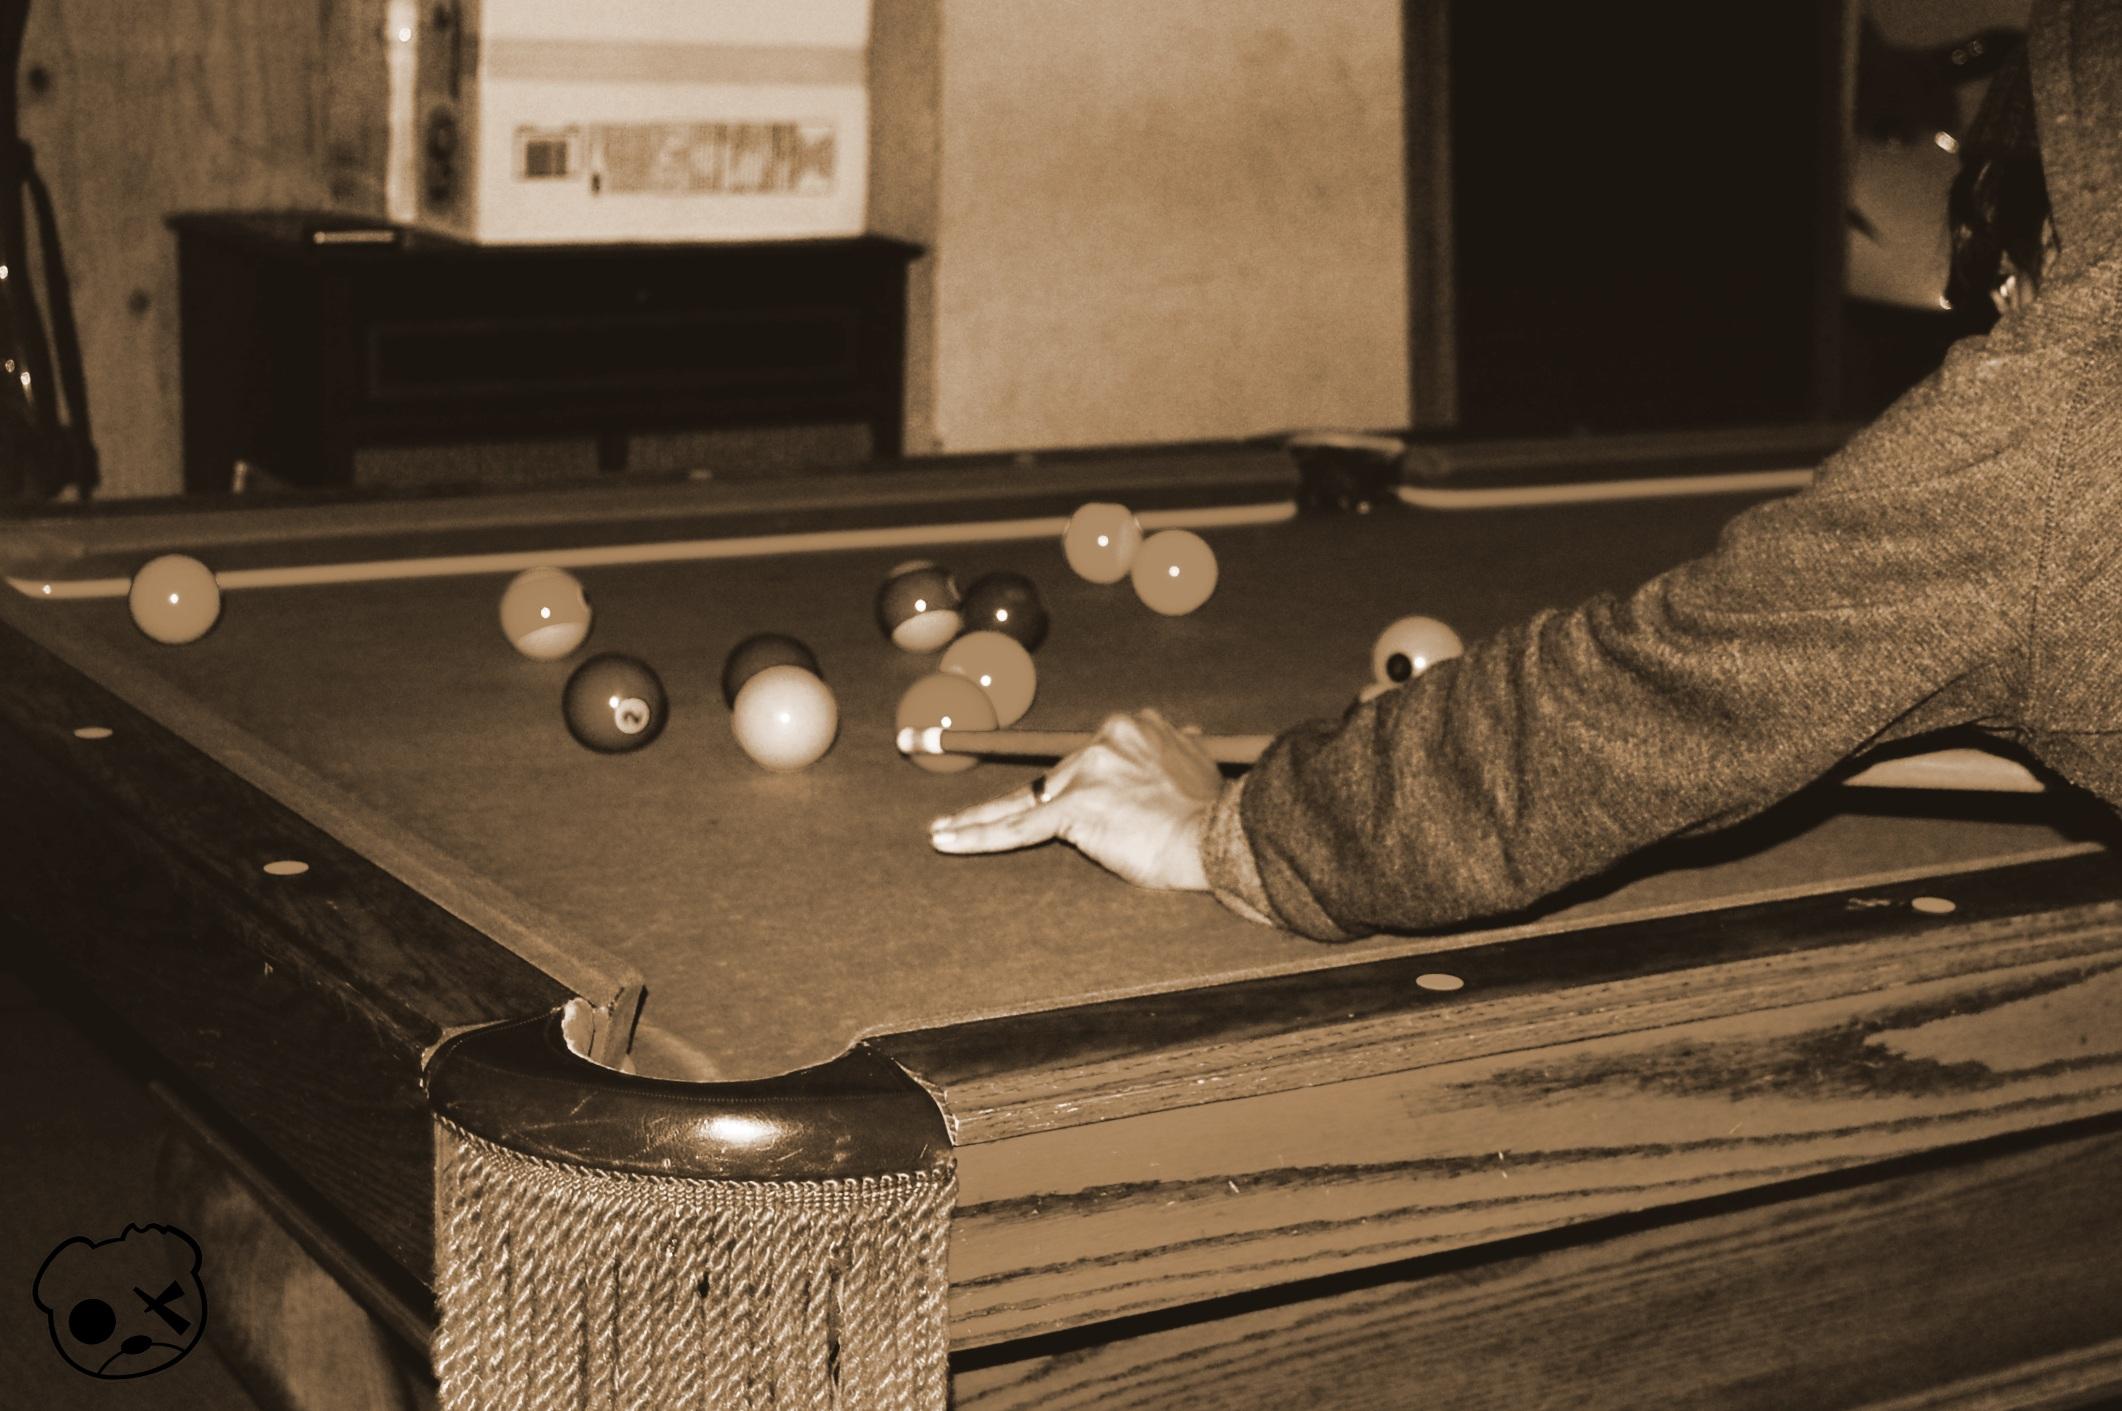 Fotos gratis : mesa, madera, guitarra, piscina, bar, piano, jugando ...